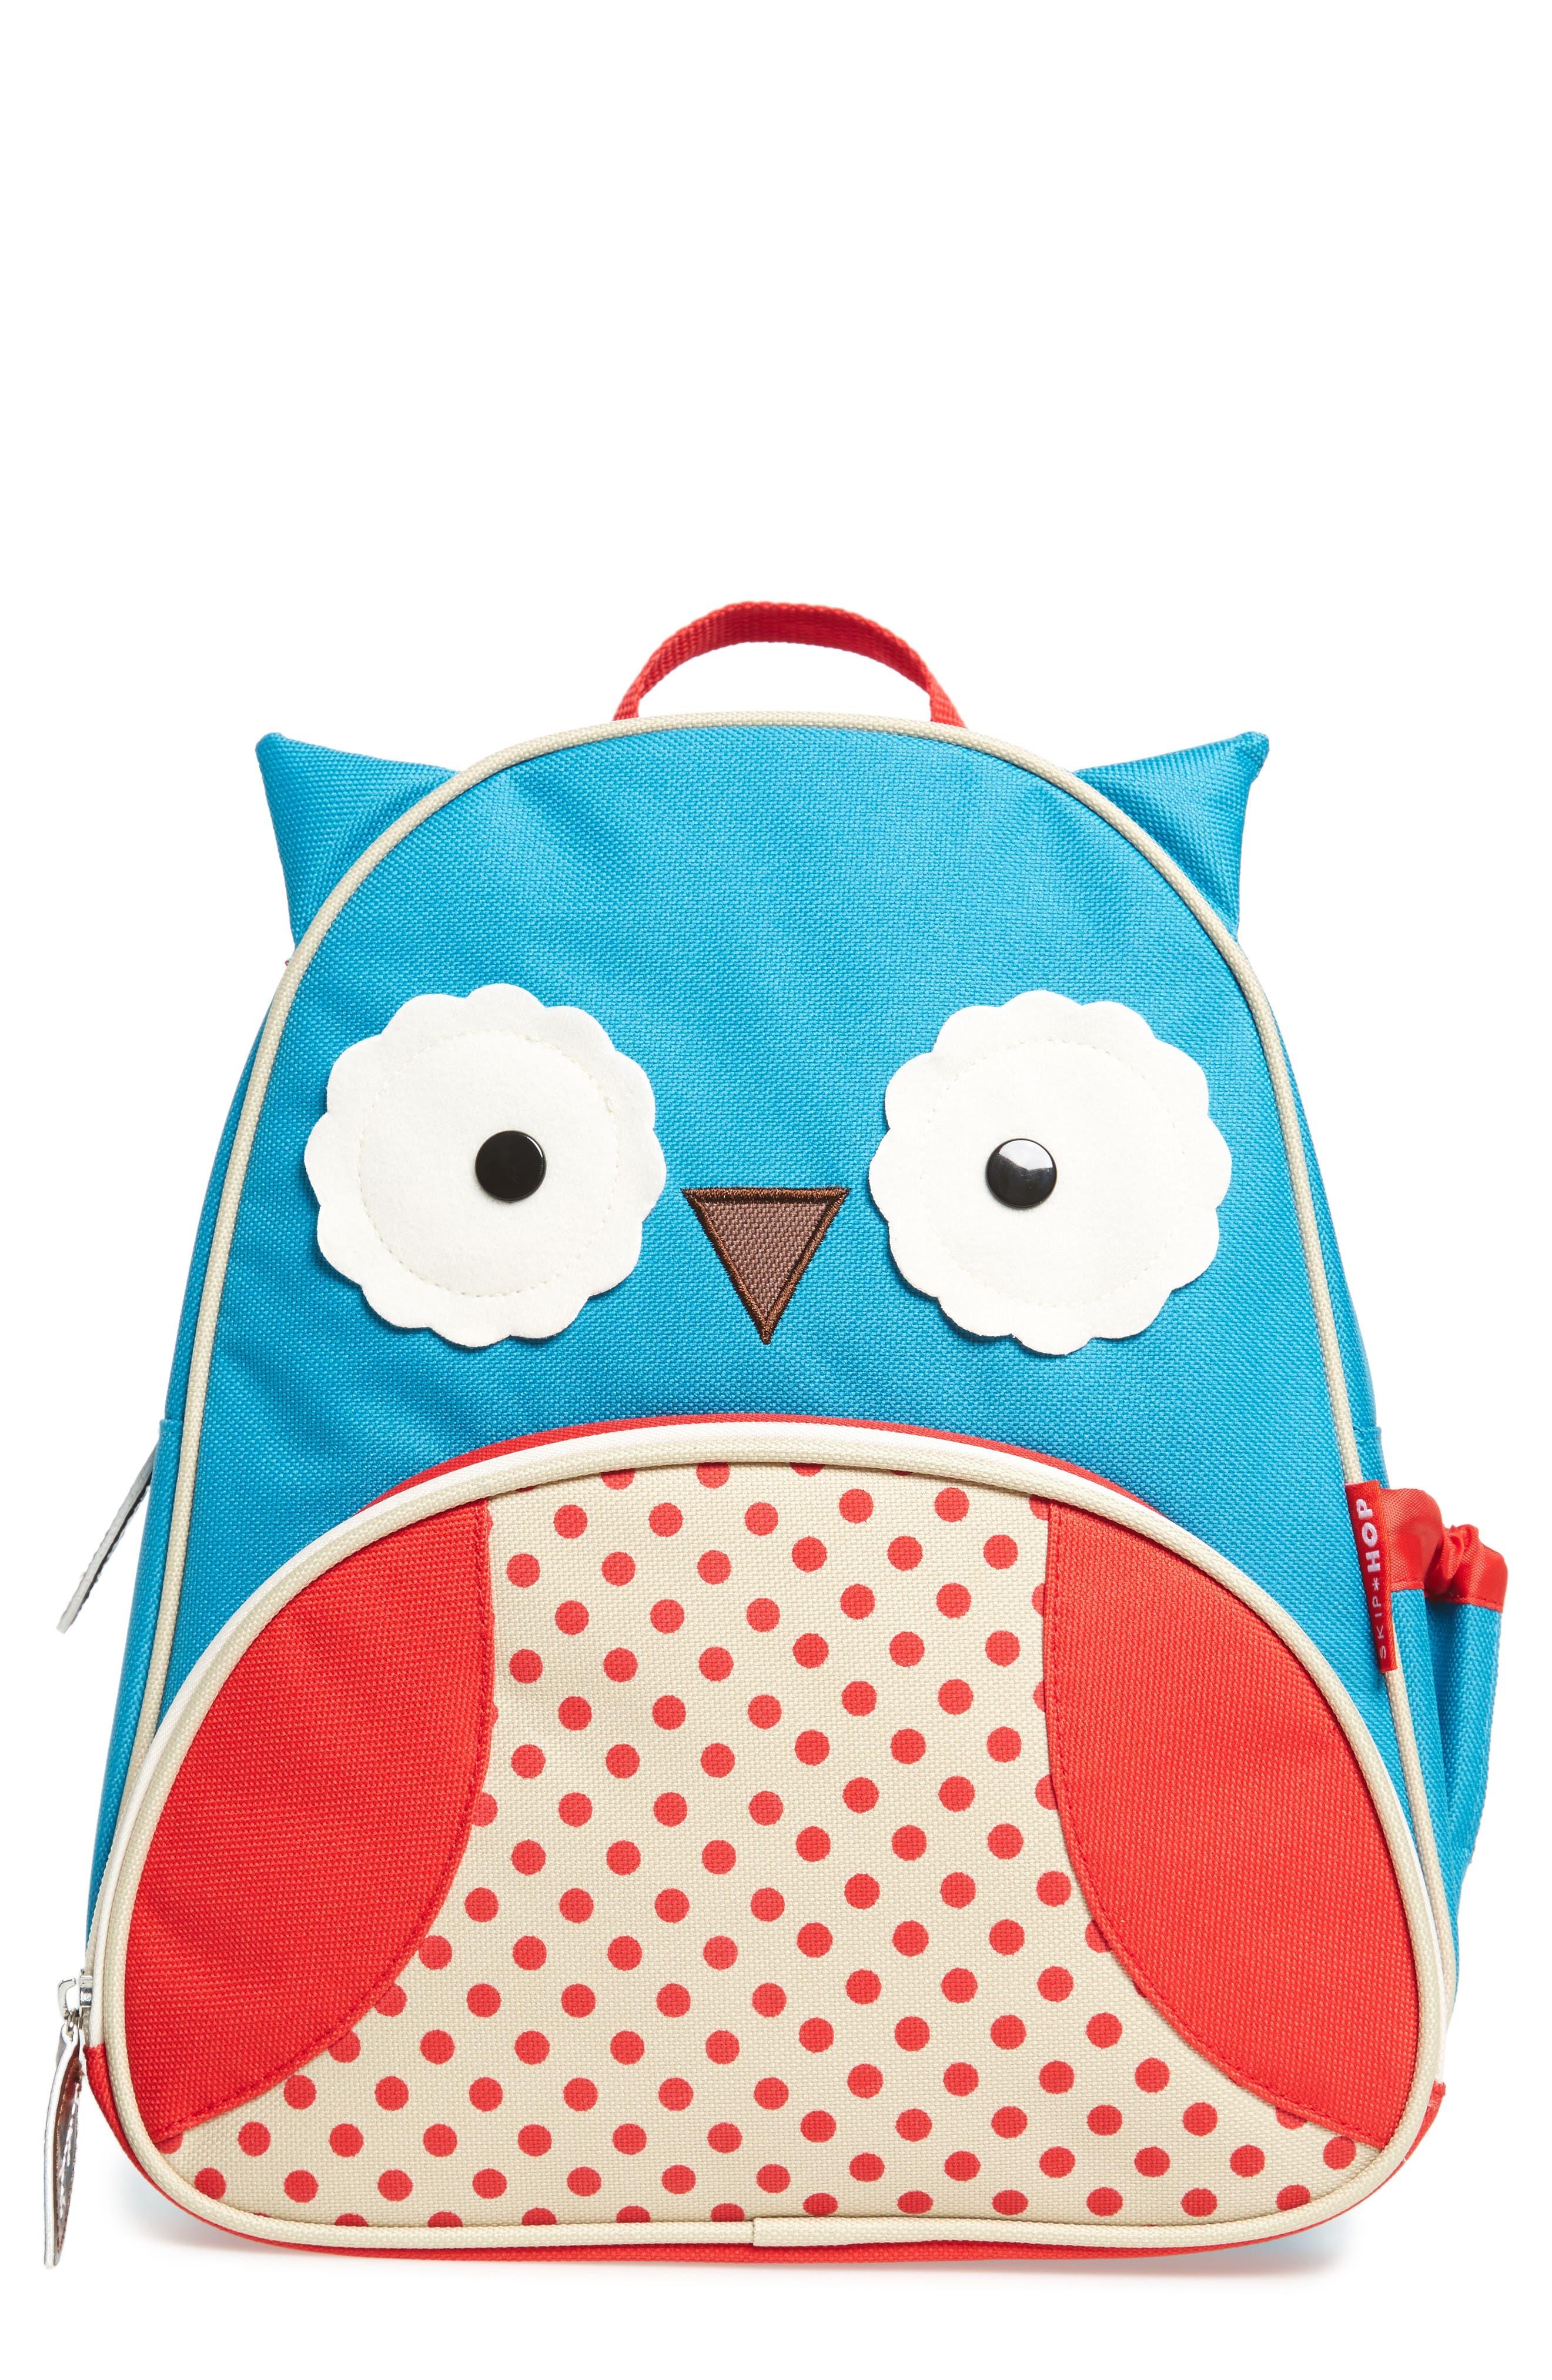 SKIP HOP Owl Zoo Pack Backpack, Main, color, BLUE MULTI